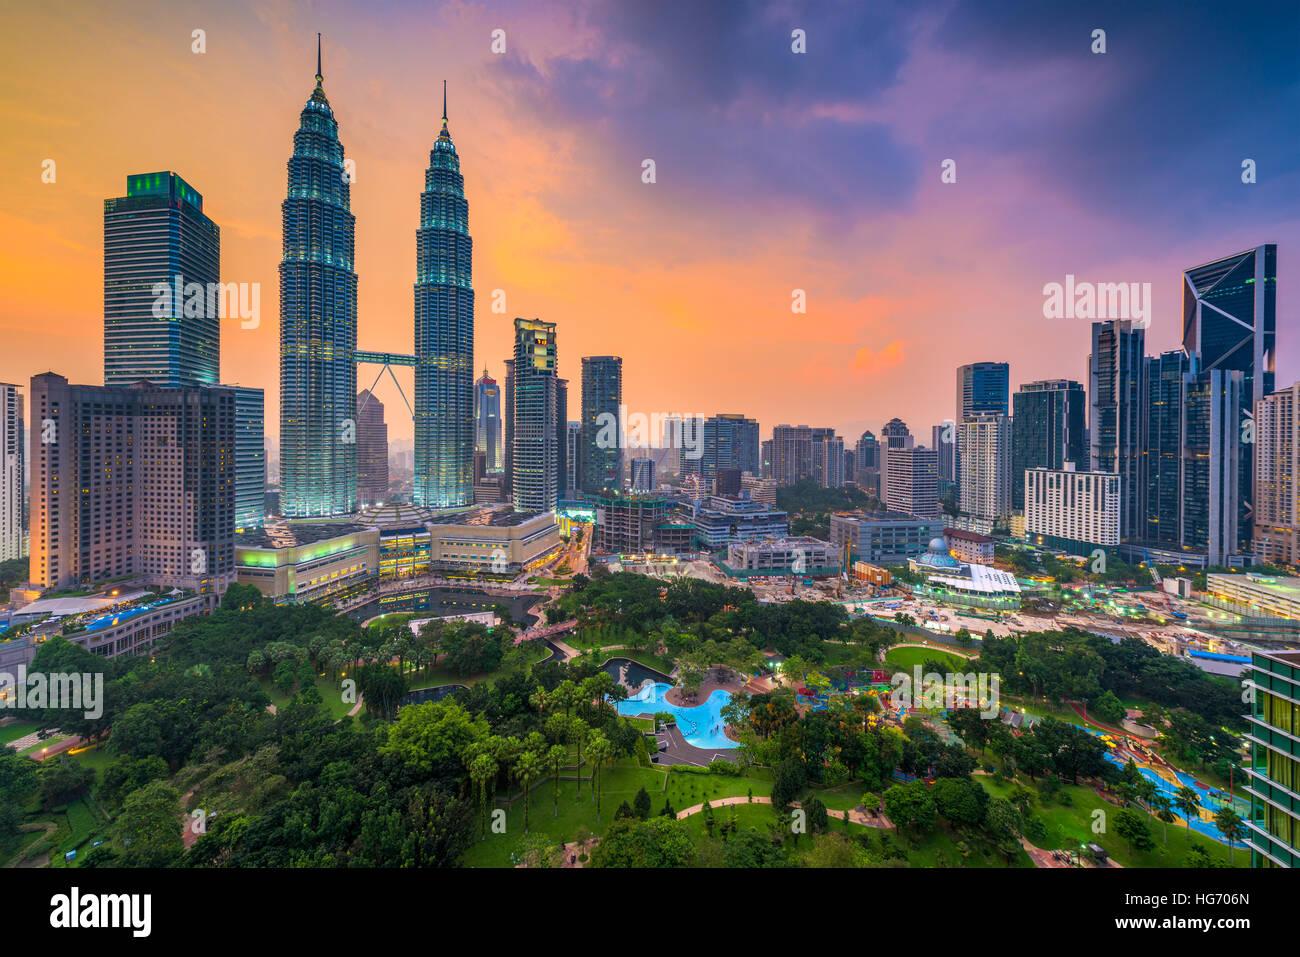 Kuala Lumpur, Malesia skyline al tramonto sul parco. Immagini Stock